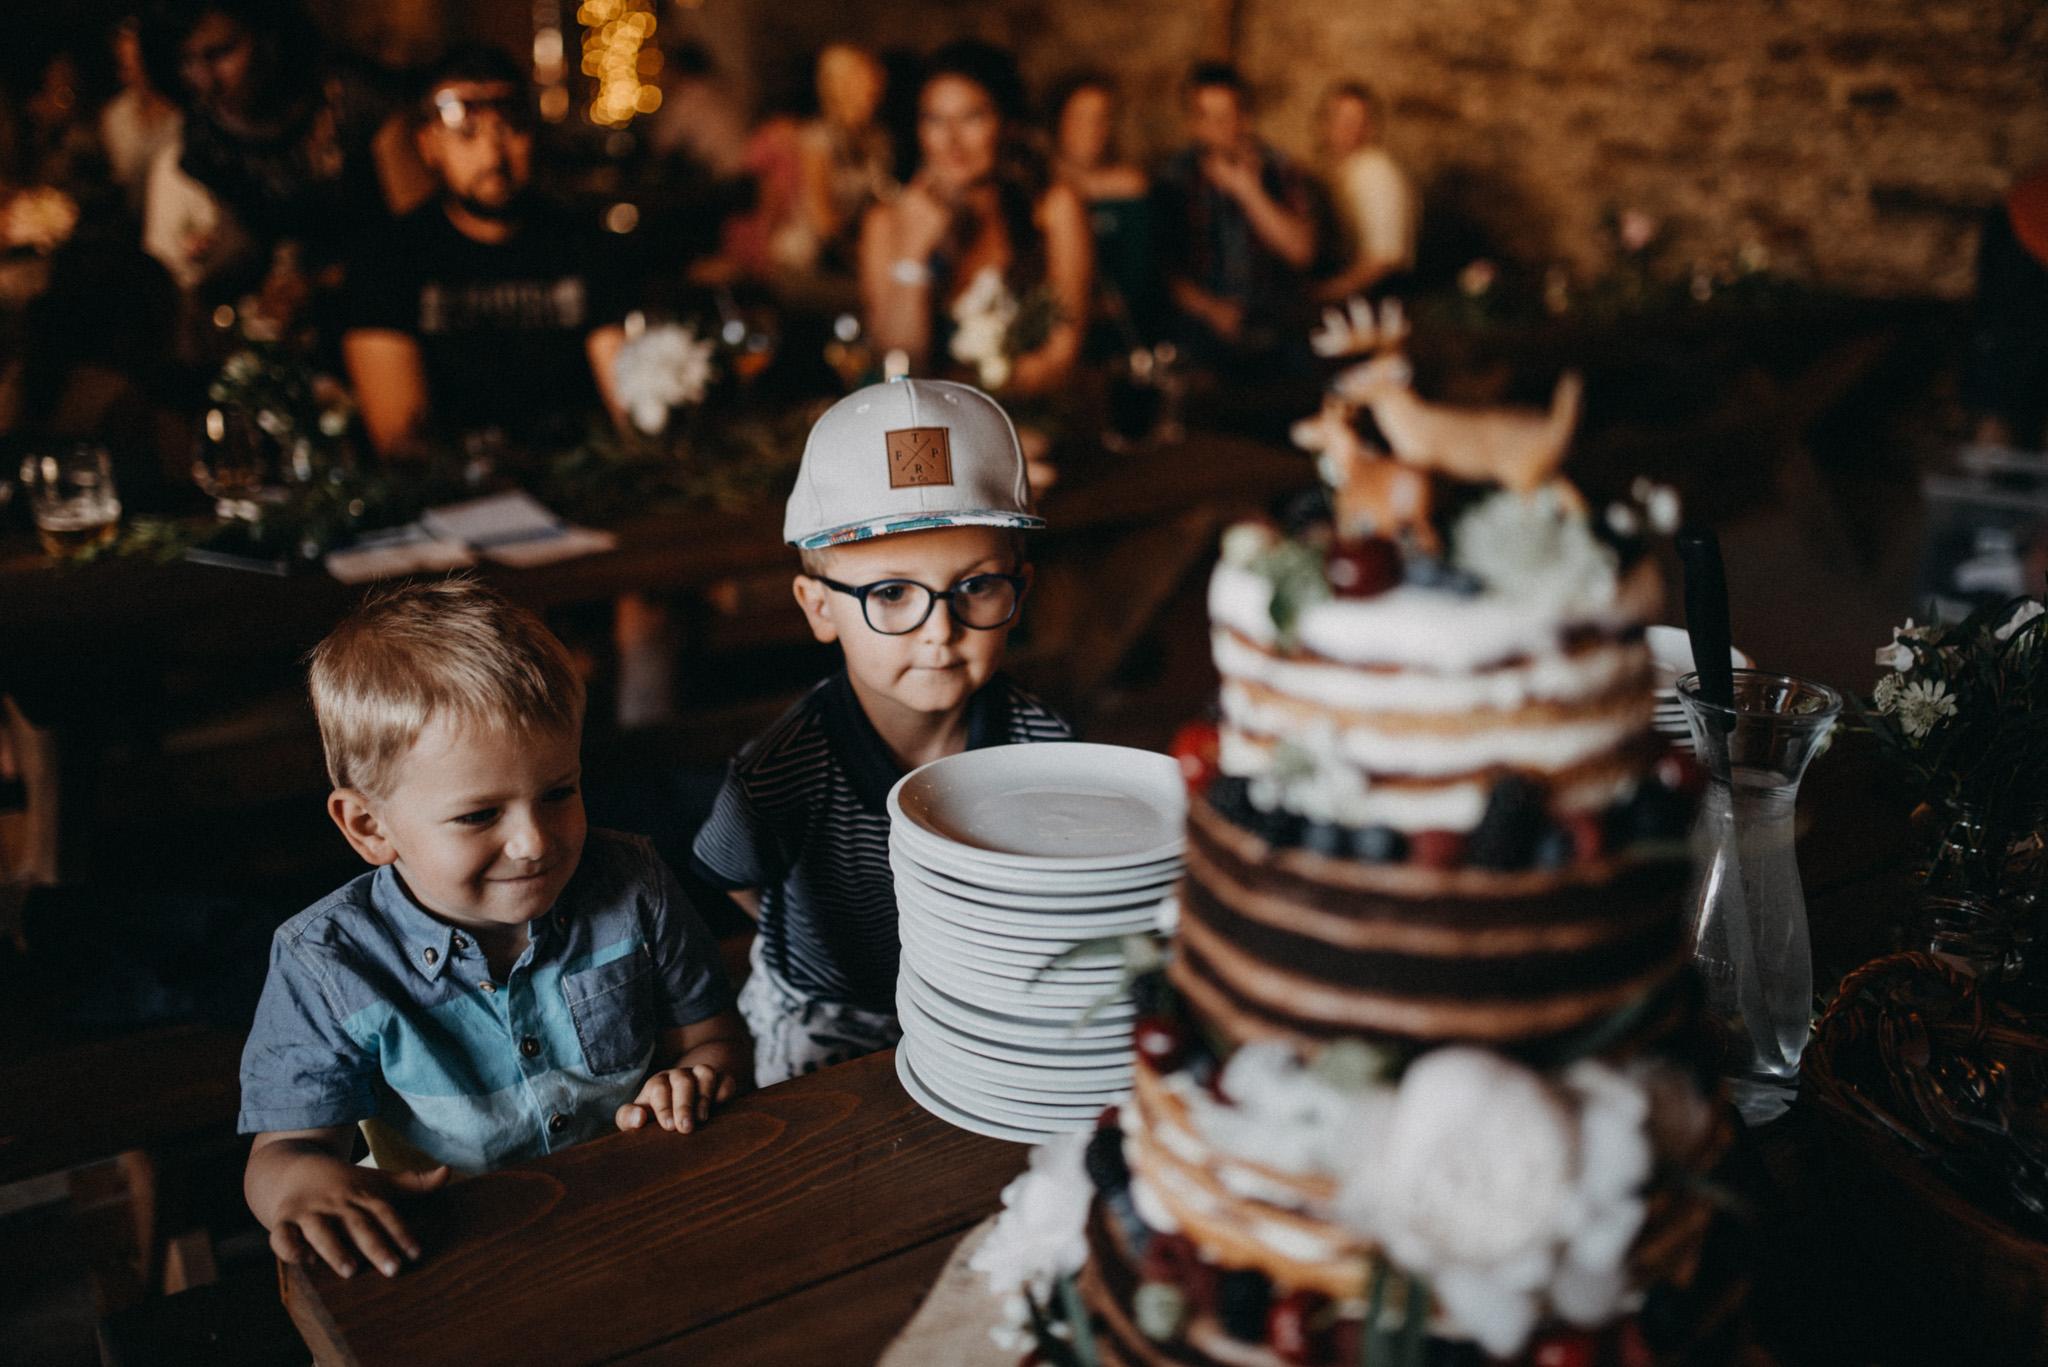 Svatba jako nezapomenutelná dobrota, fotografie Honza Bartoň na blogu Originální Svatba